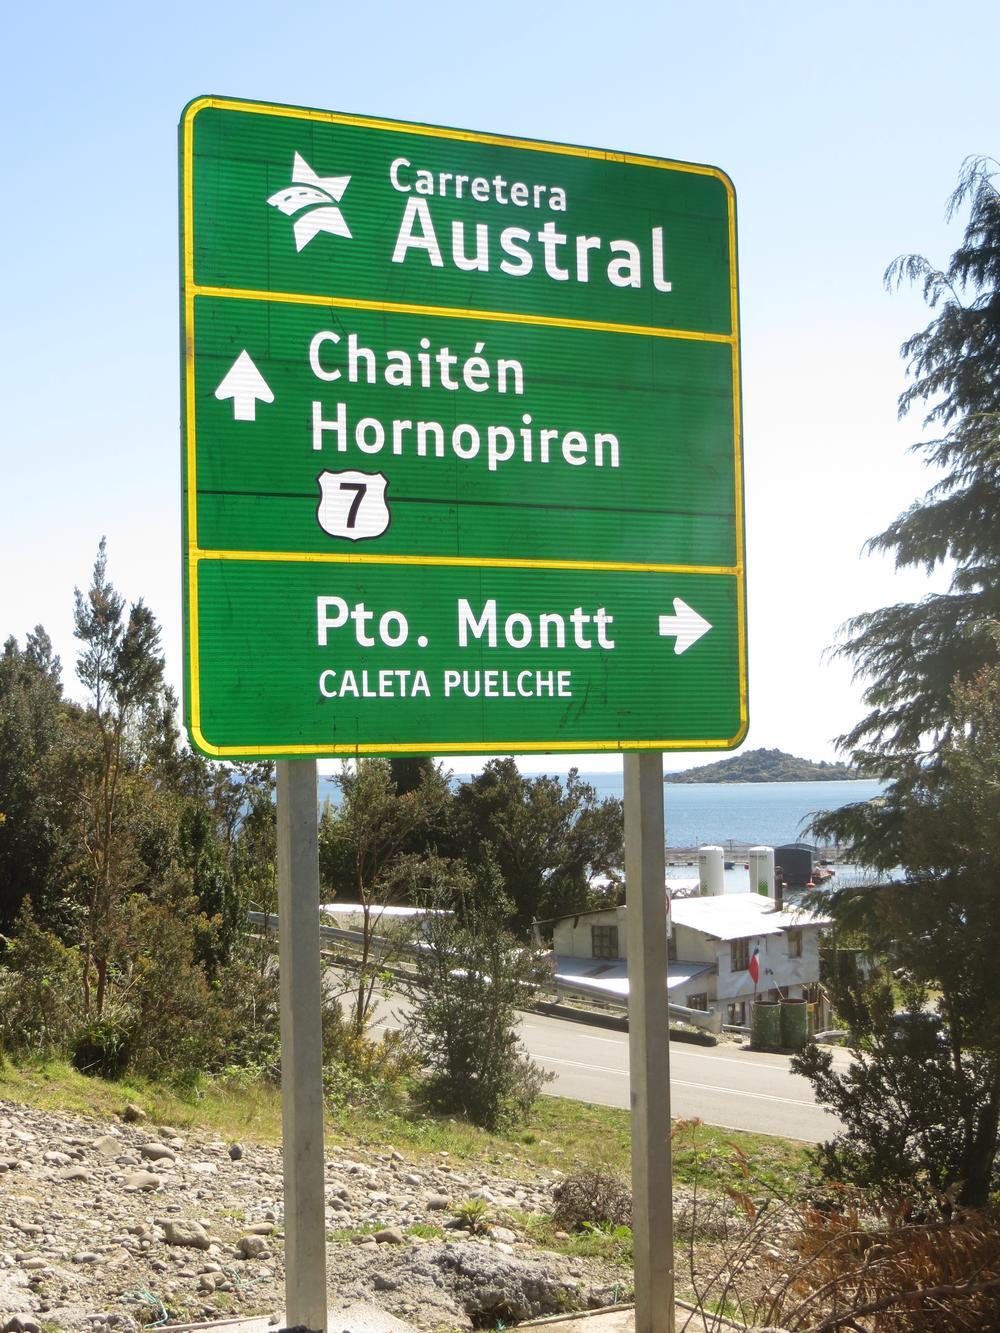 Carretera austral (10).JPG